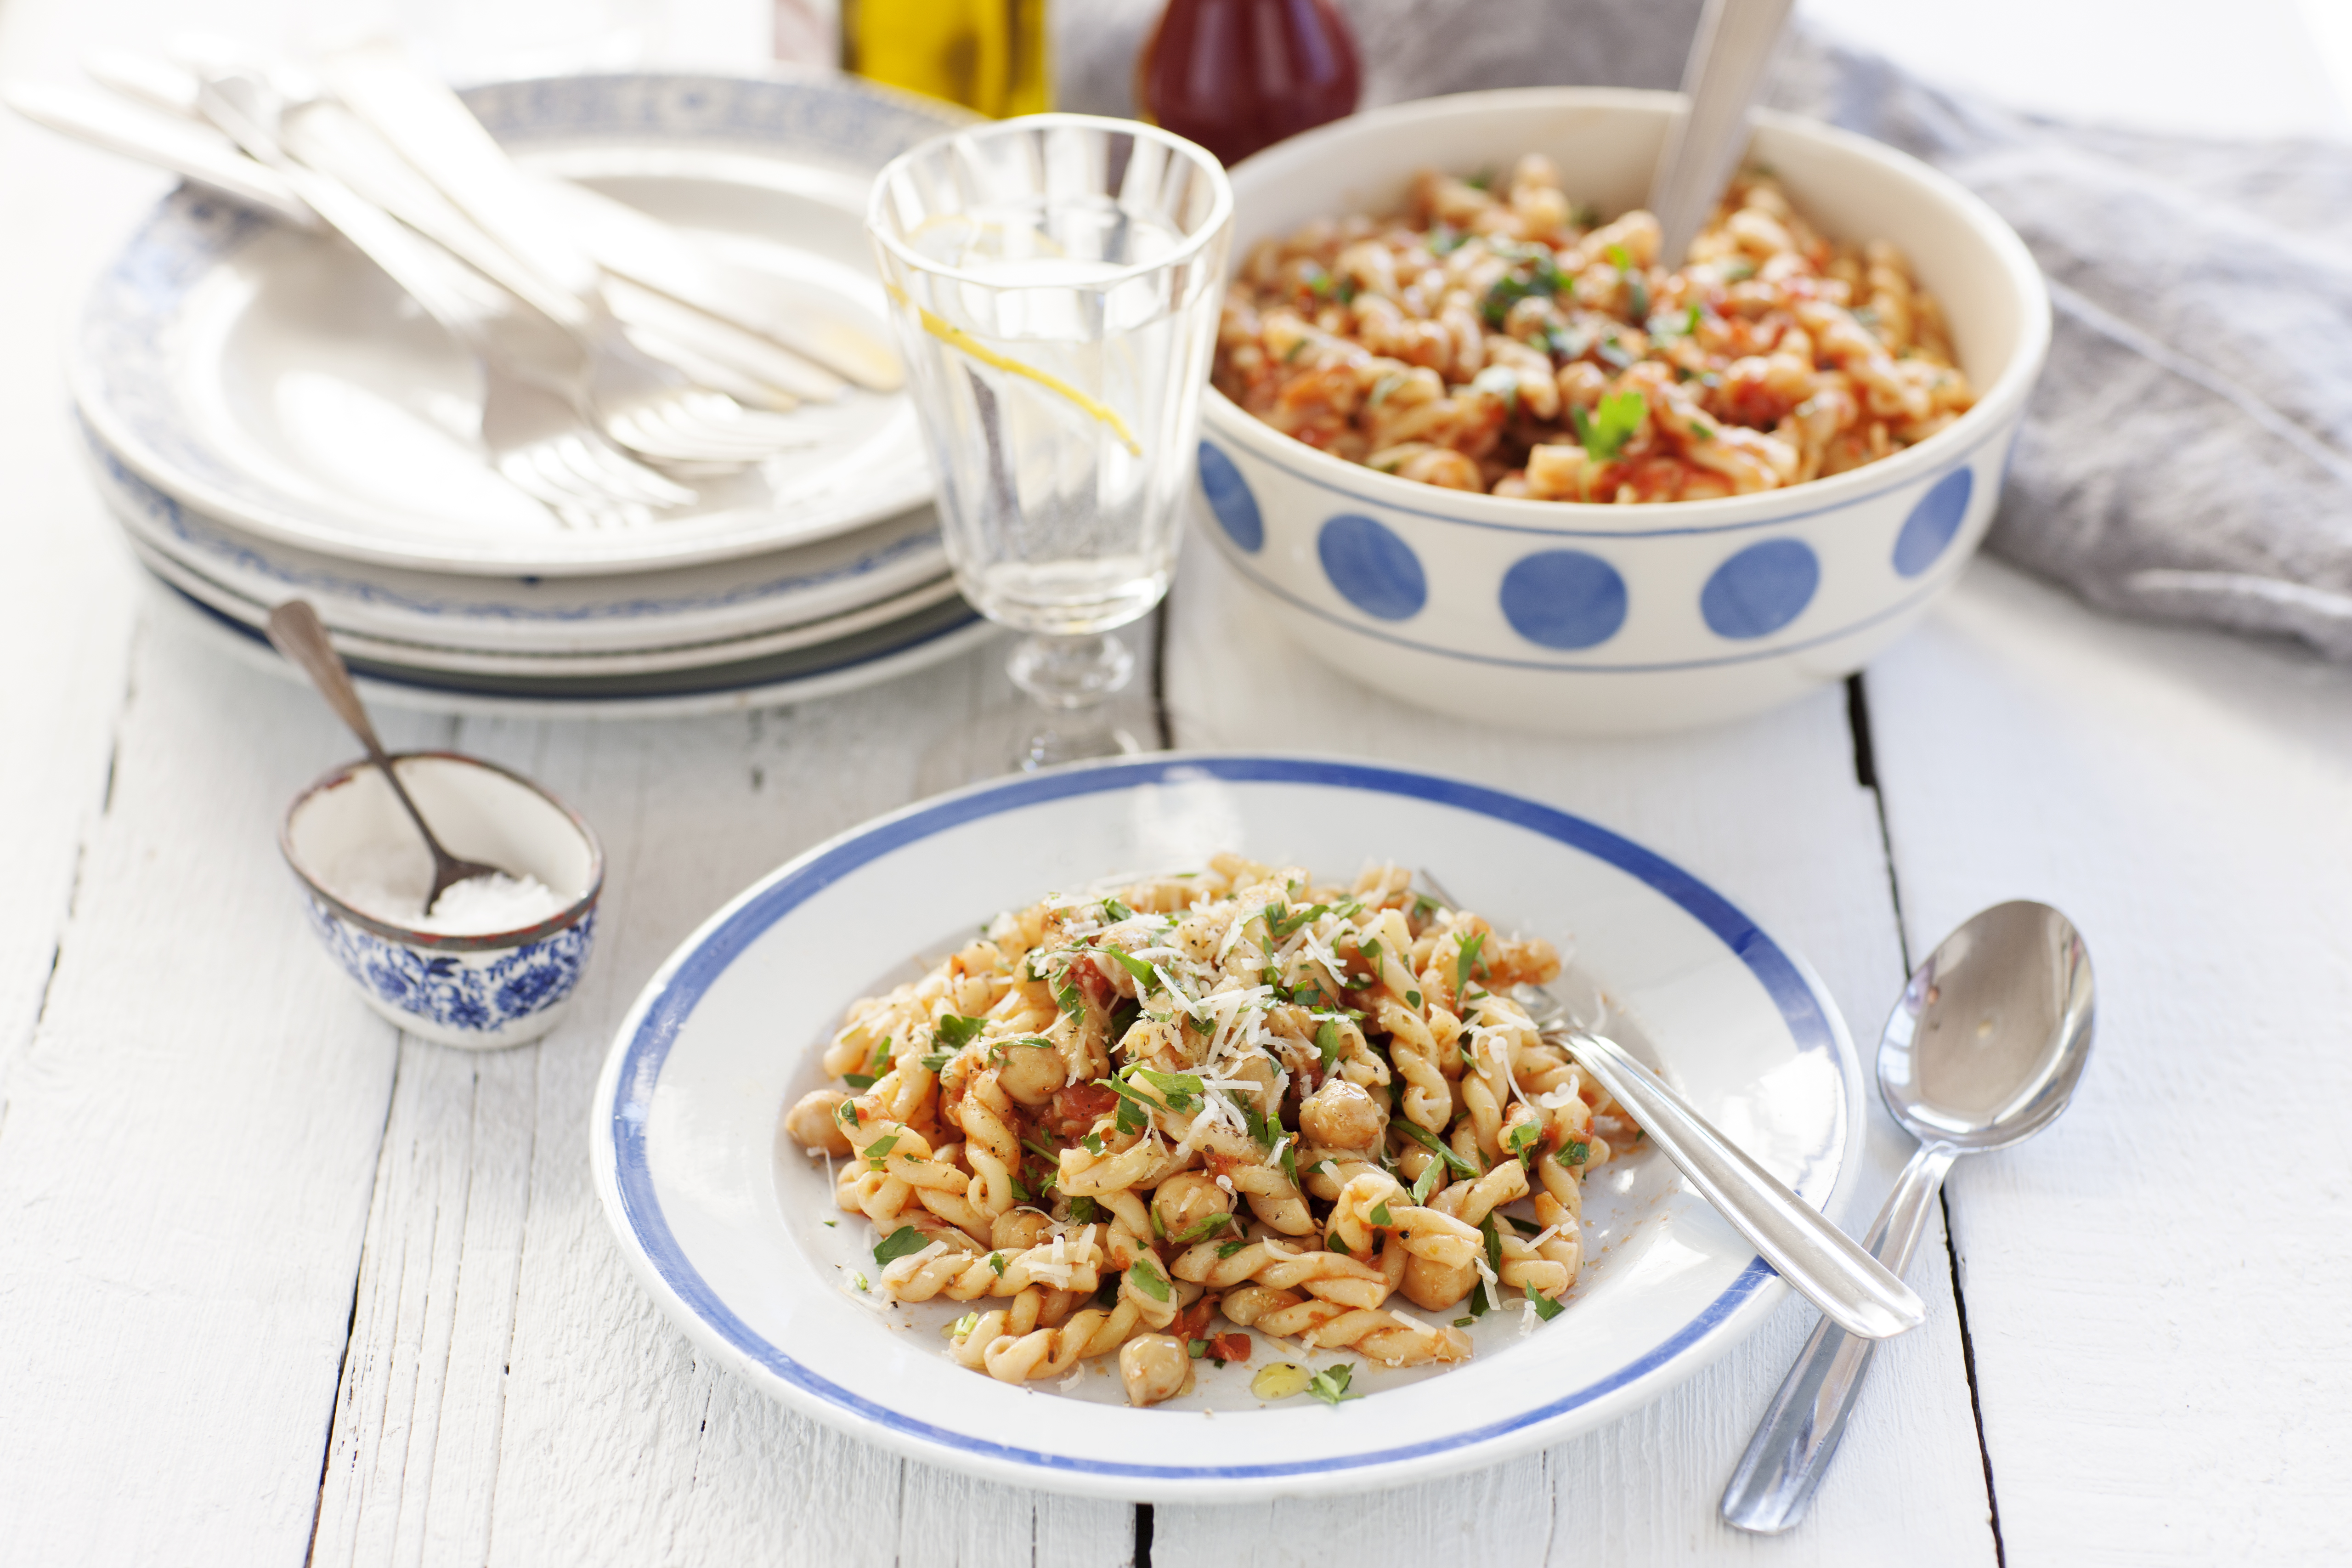 zeta recept pasta